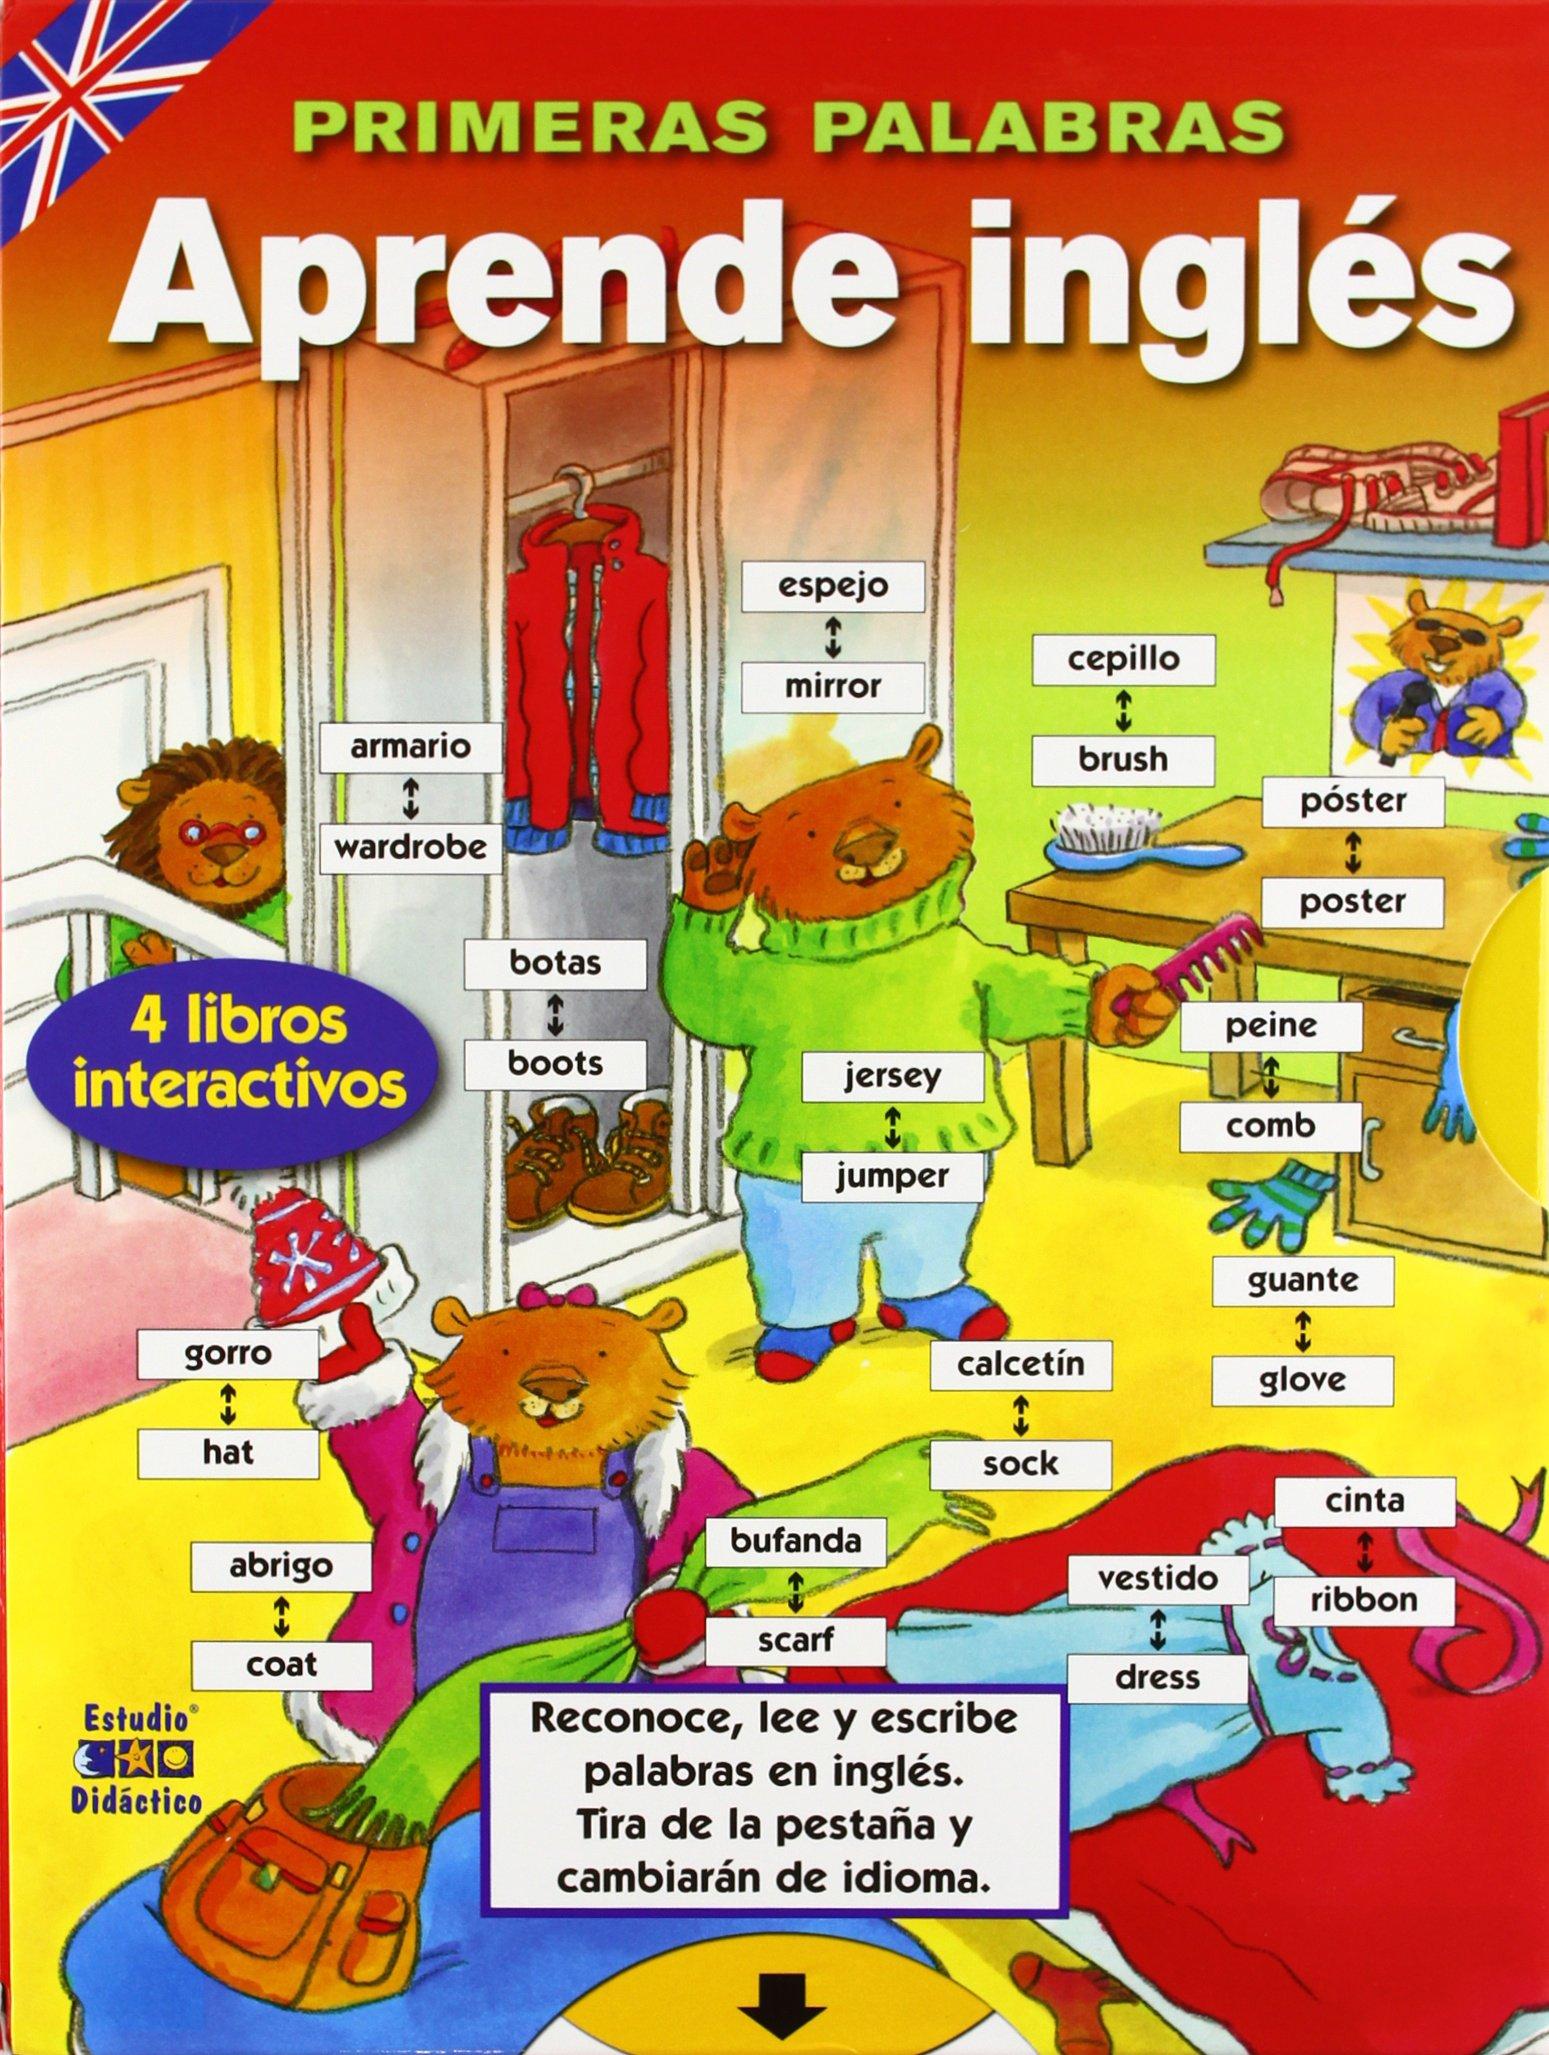 APRENDE INGLES PACK PRIM-PALA E.DIDAC (Spanish) Hardcover